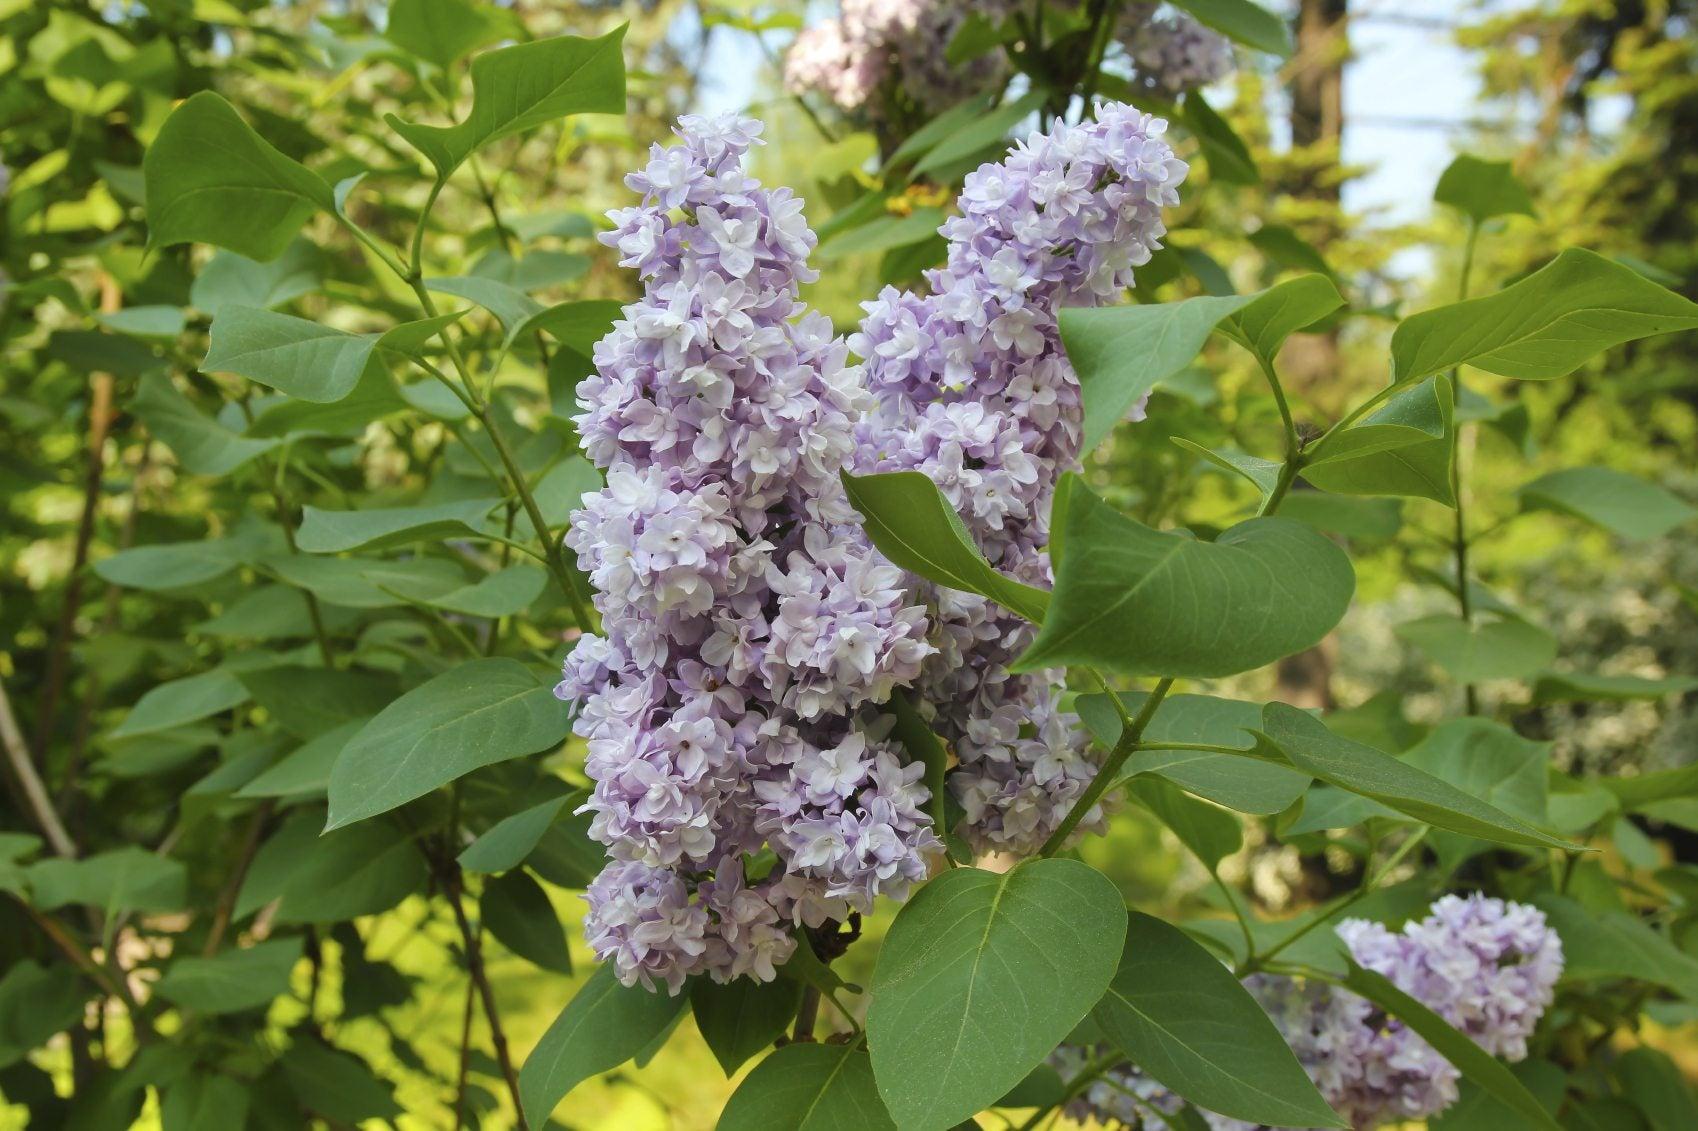 Best Drought Tolerant Shrubs – Drought Tolerant Flowering Shrubs And Evergreens